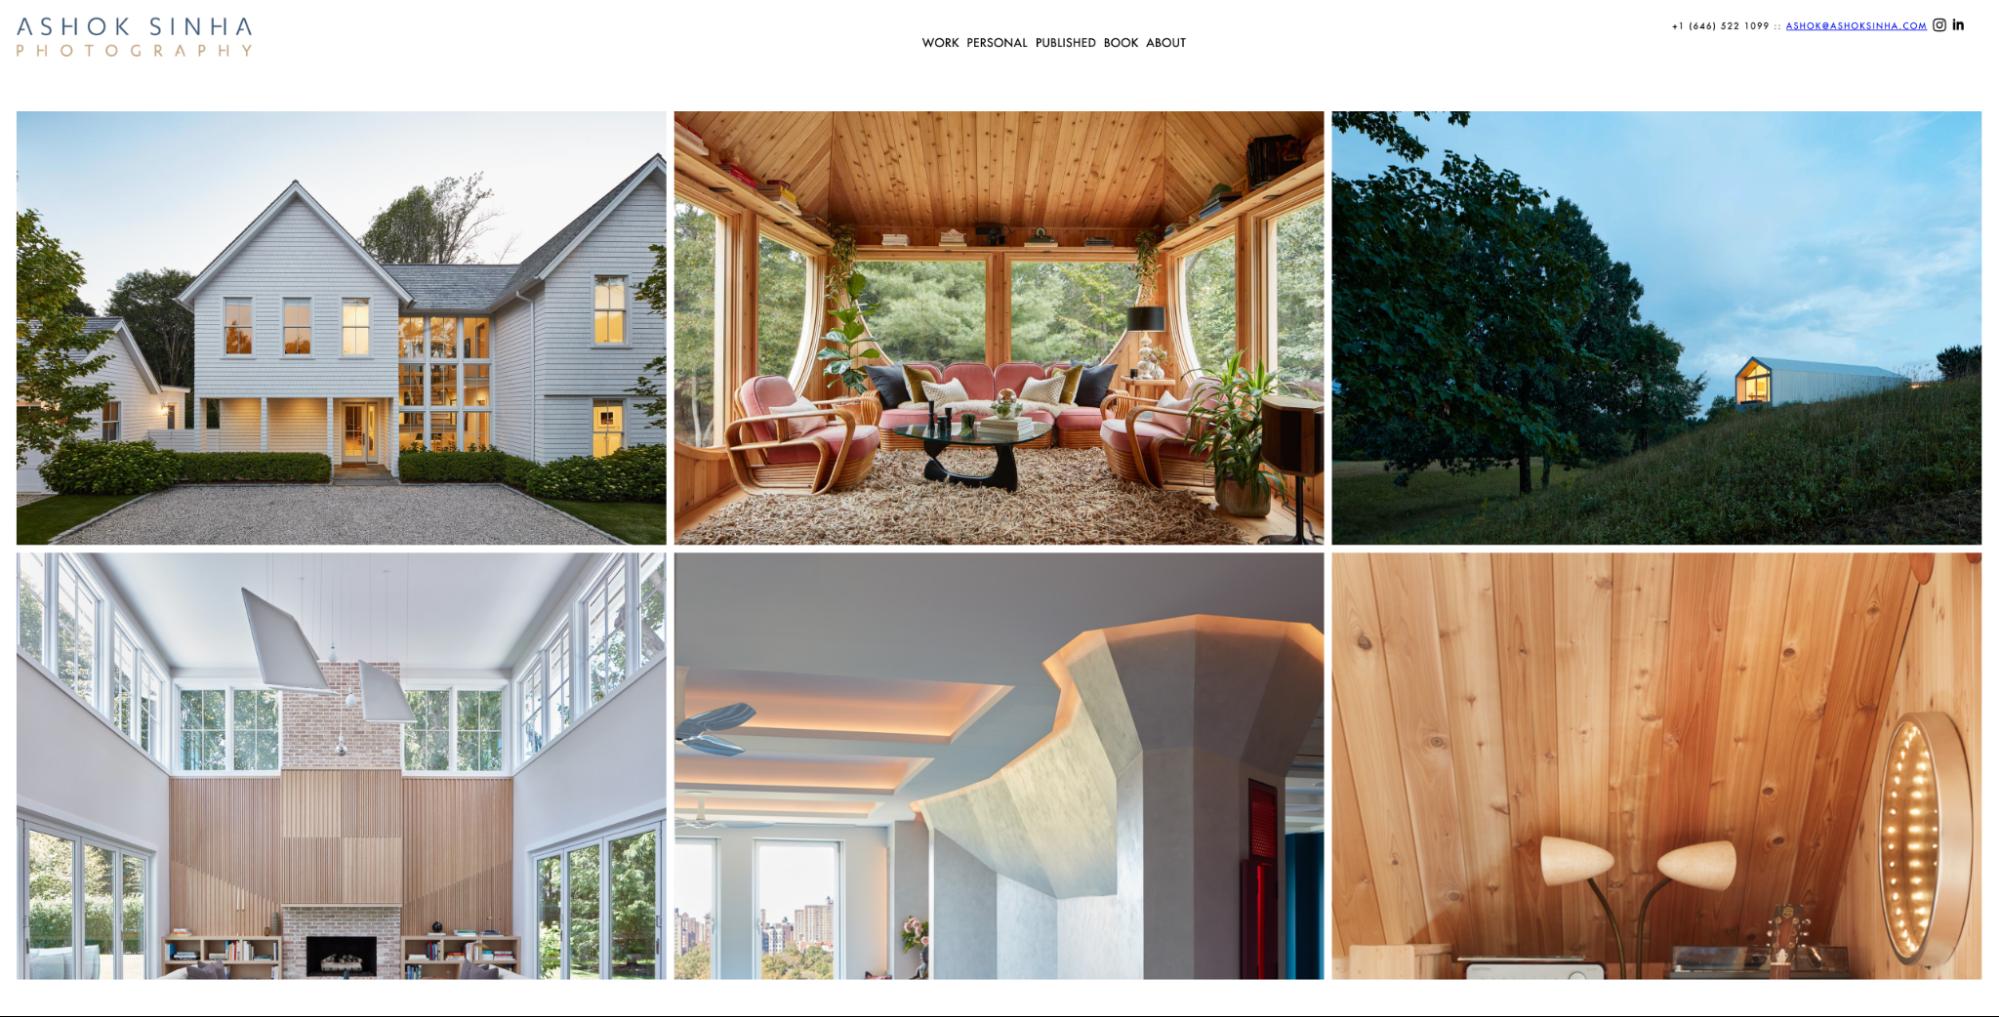 Grid photo layout on a portfolio website.